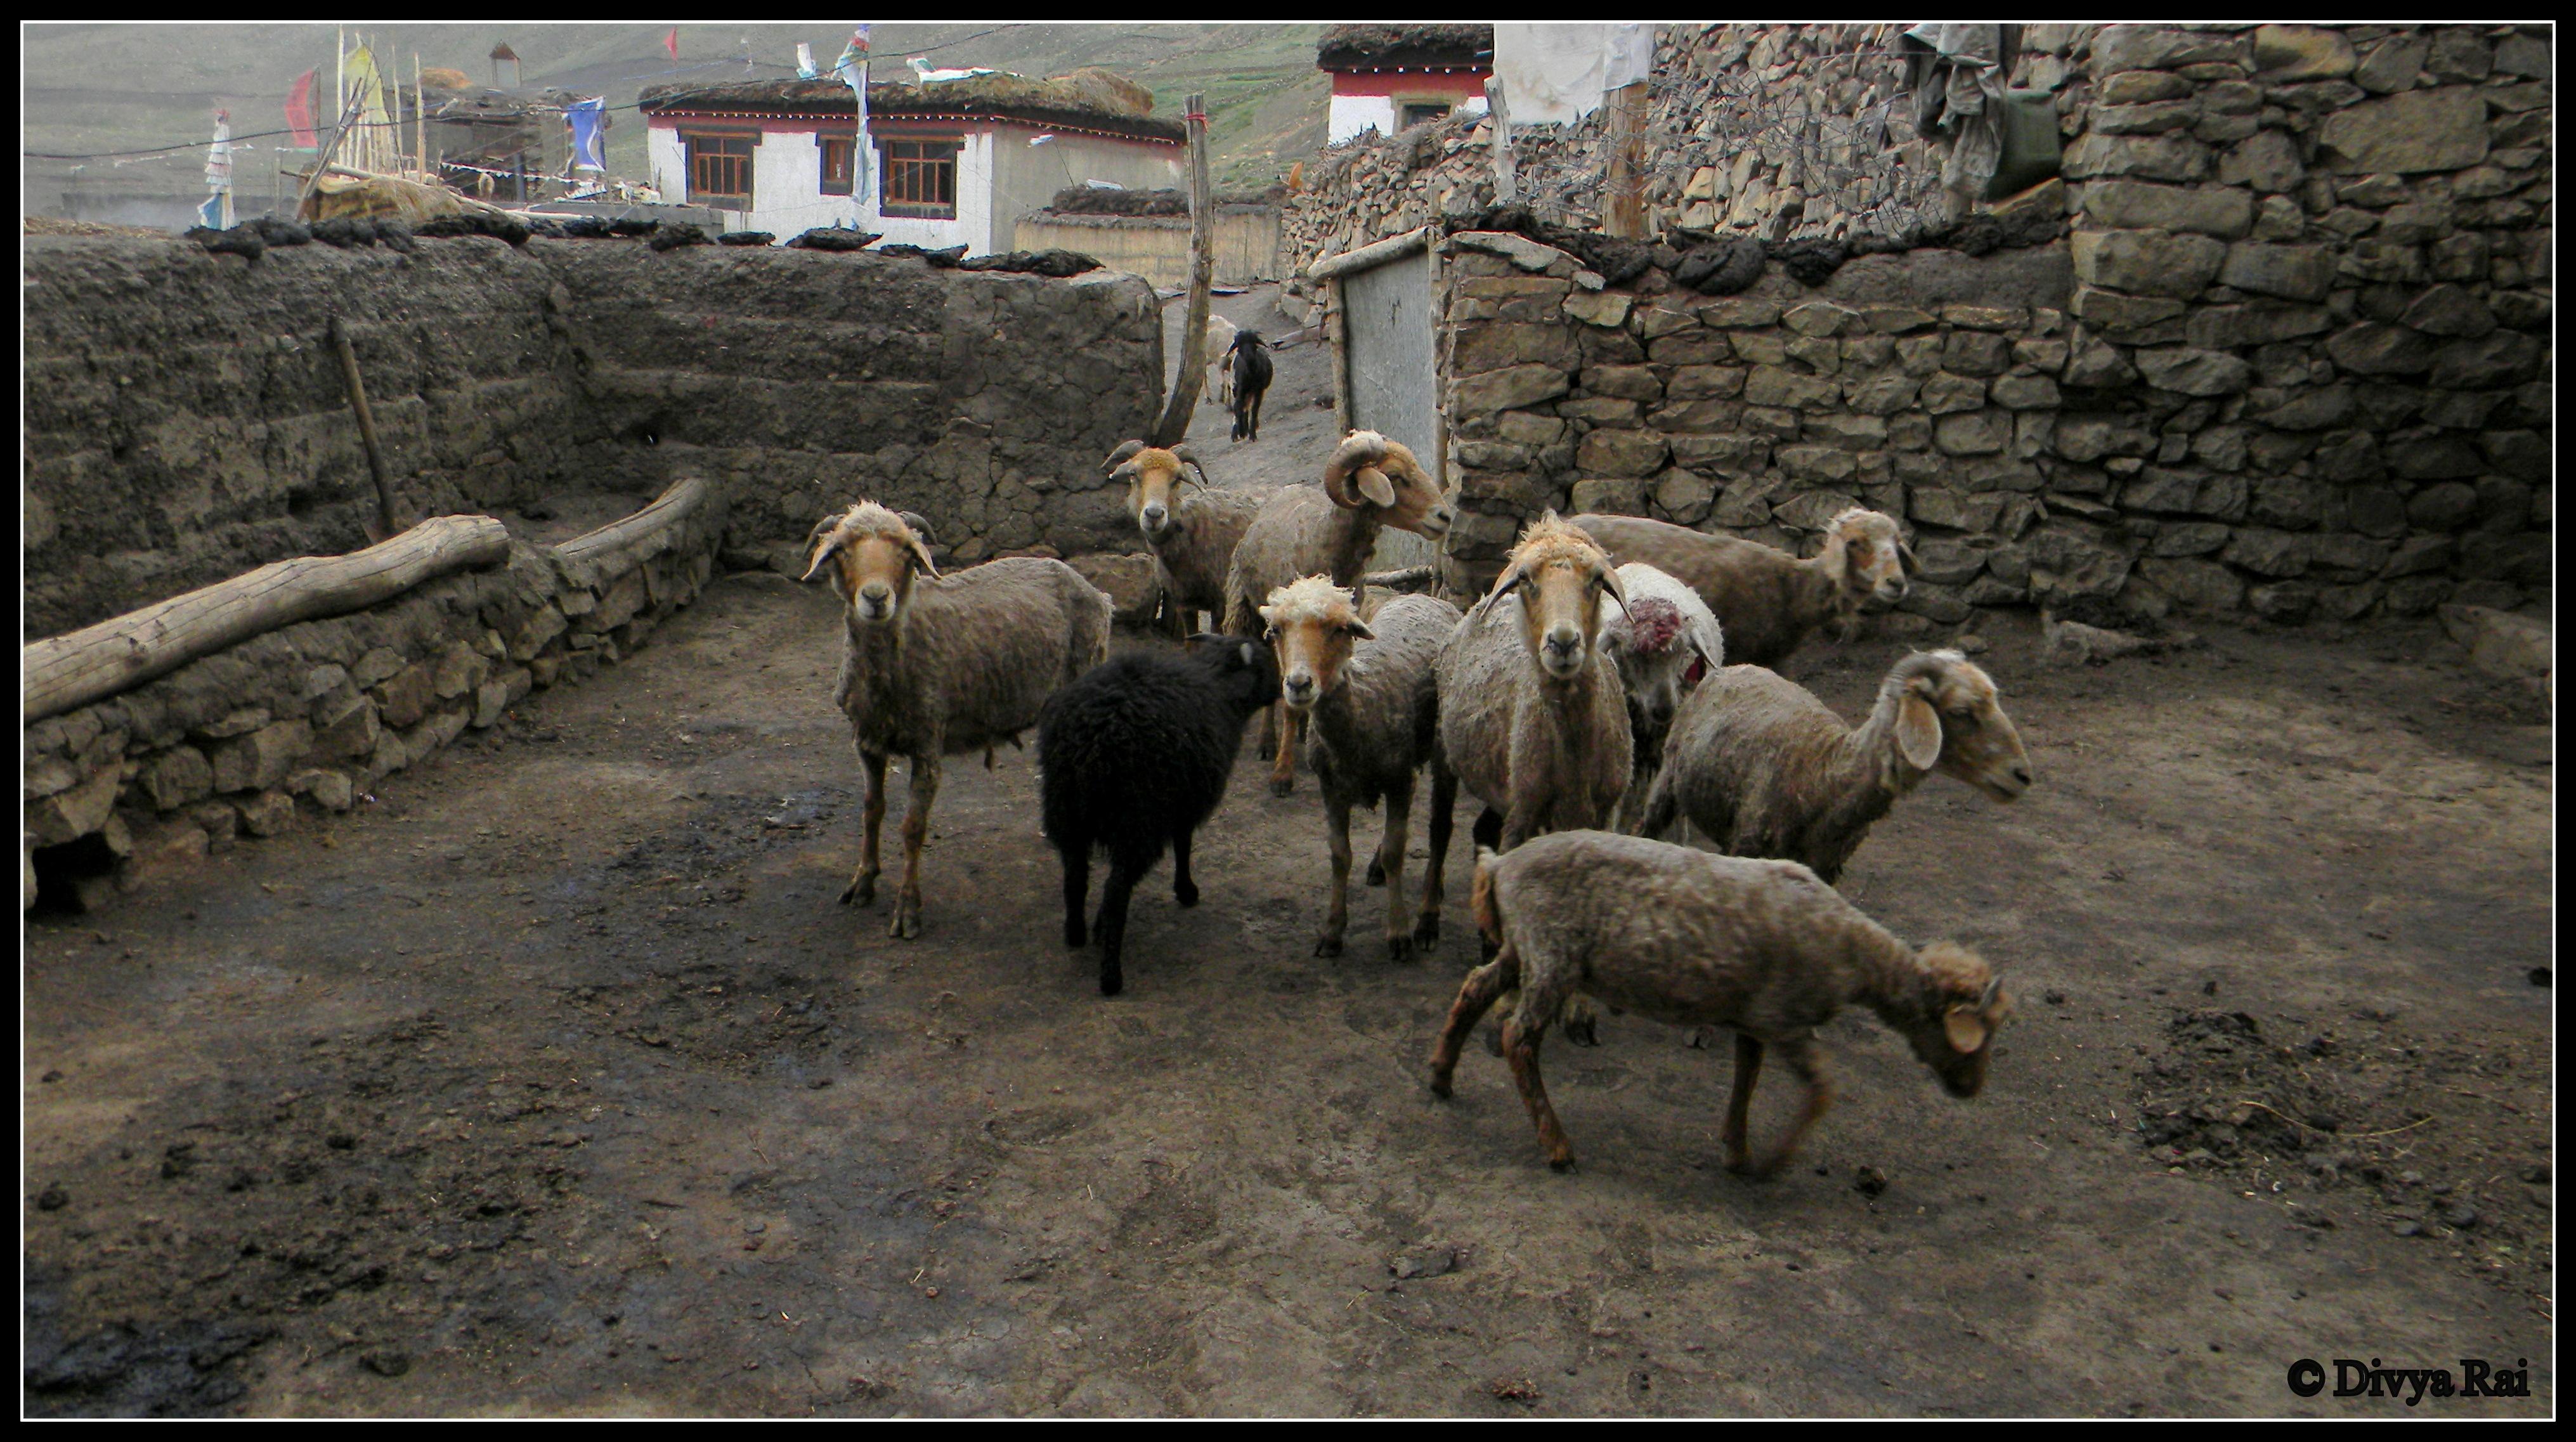 Himlayan village life